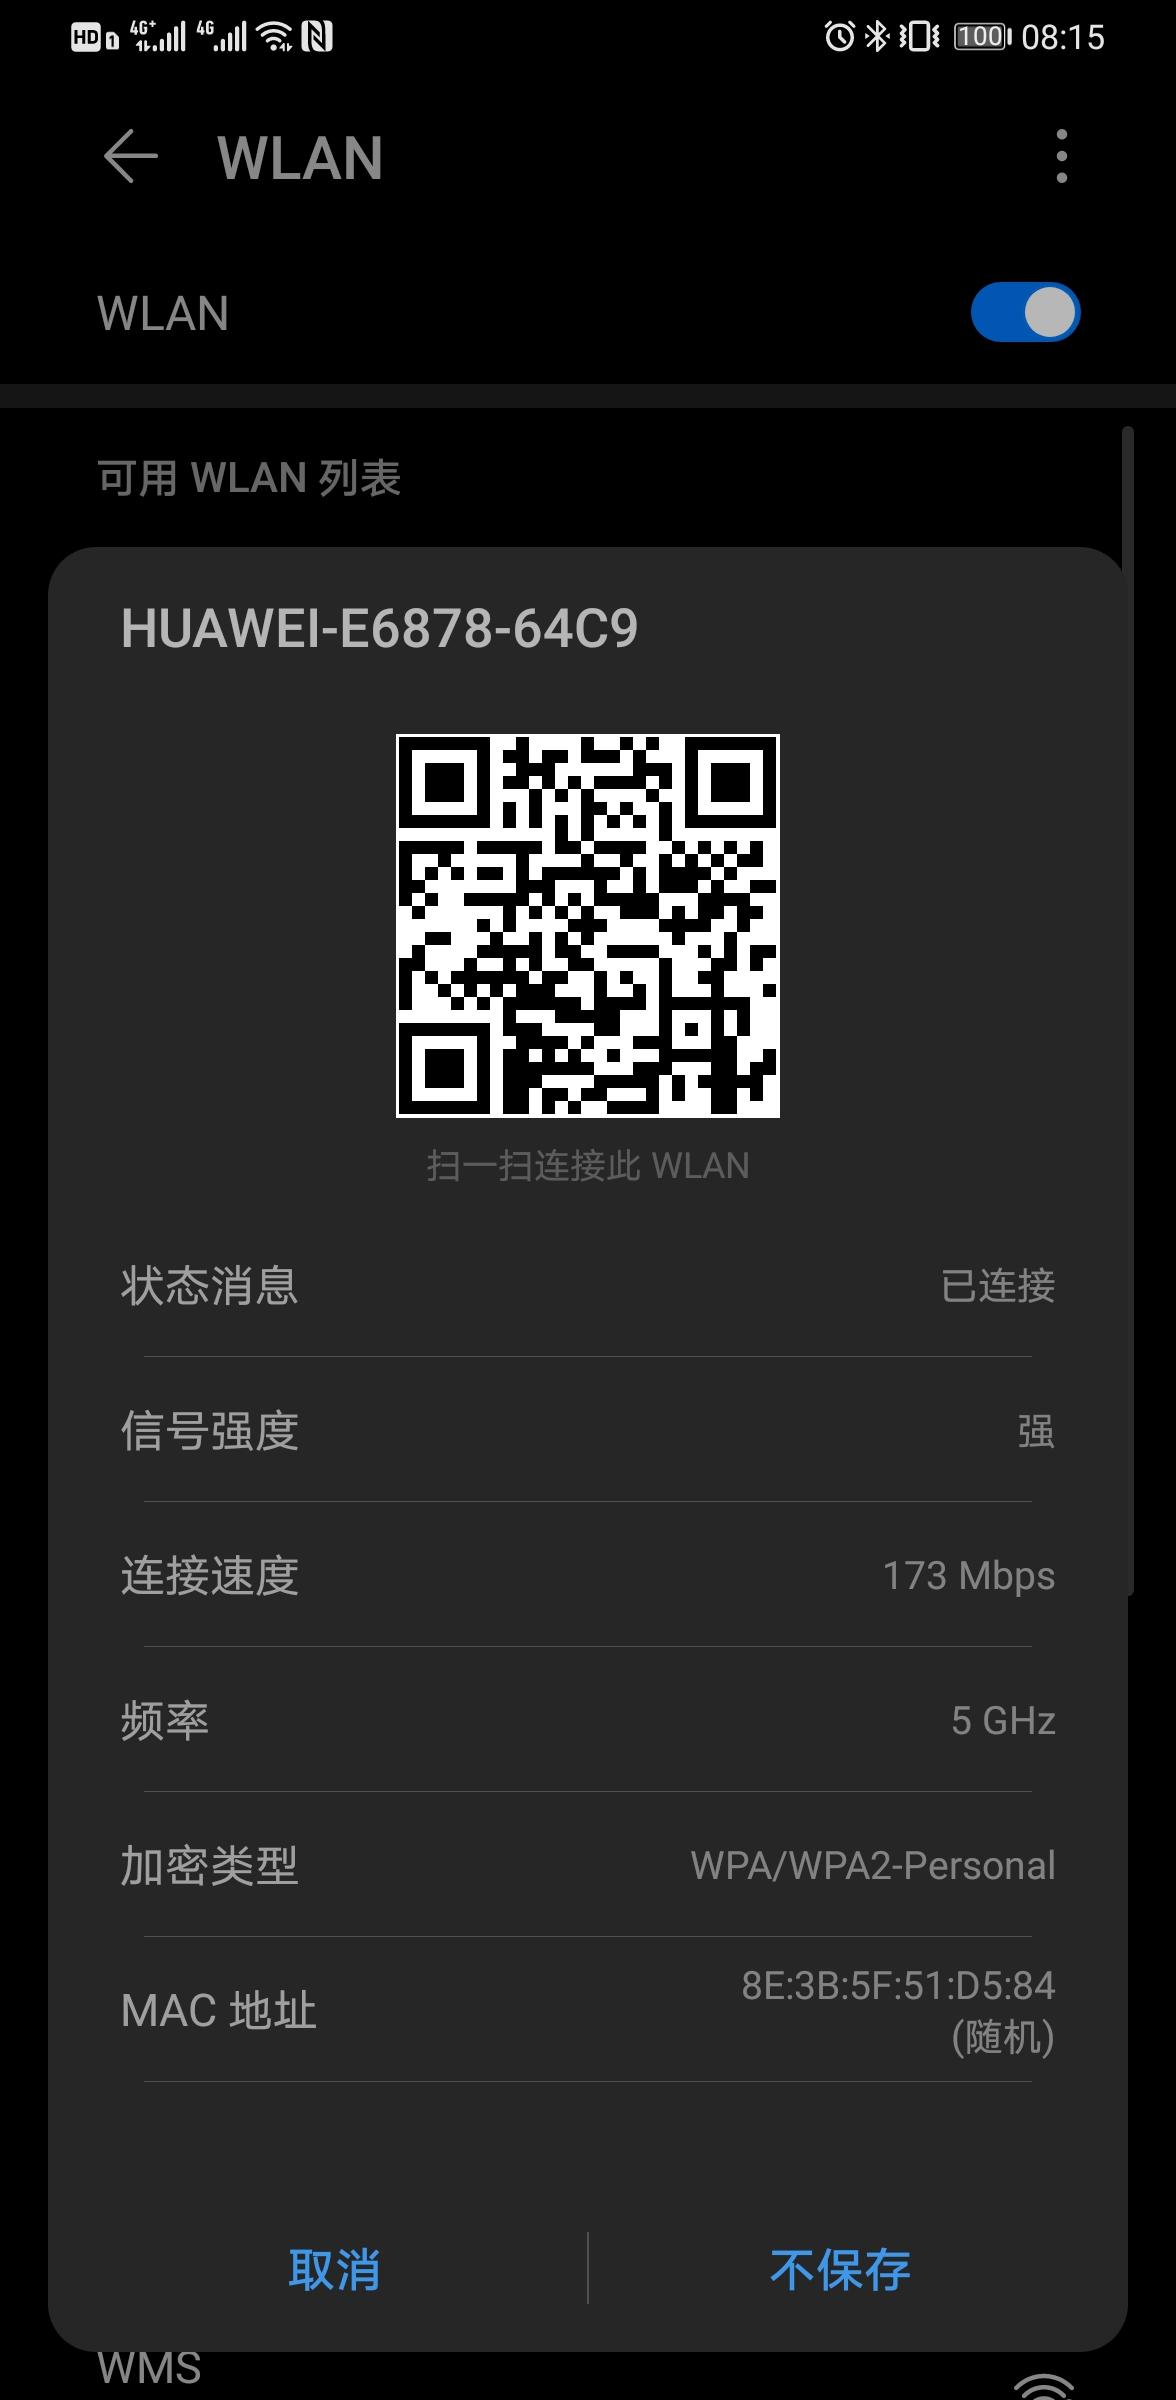 Screenshot_20200410_081504_com.android.settings.jpg